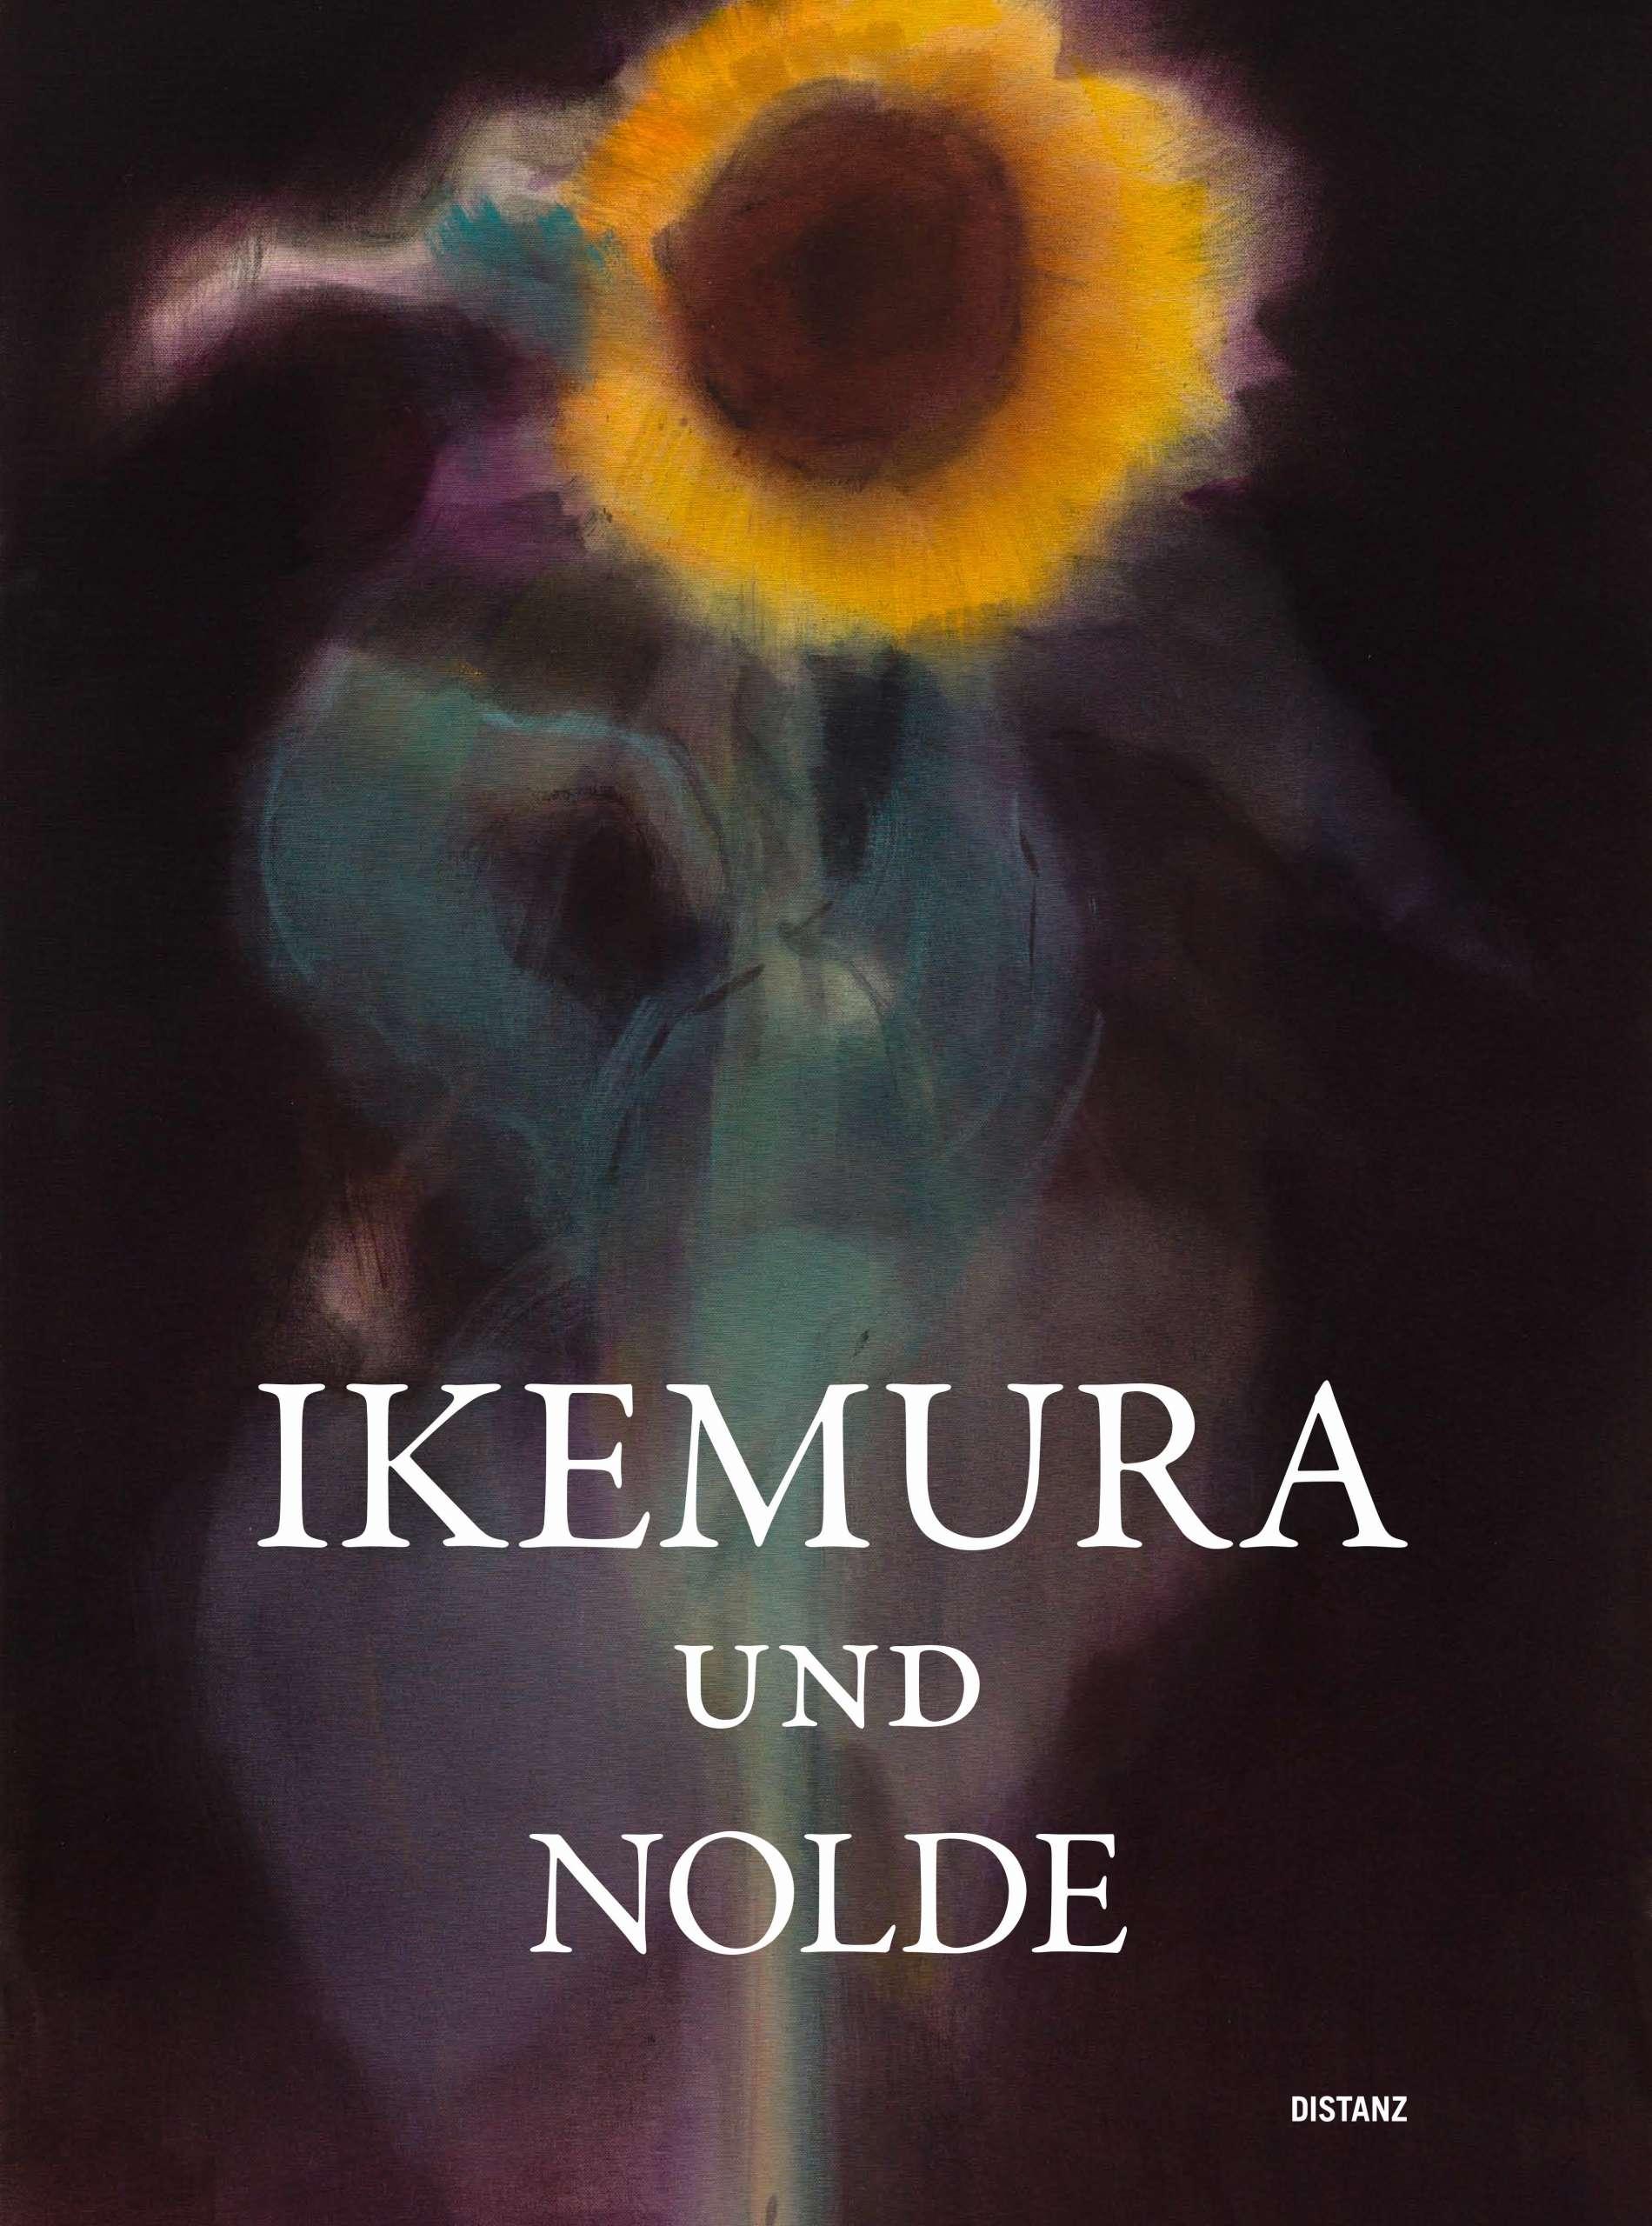 Ausstellungskatalog Ikemura und Nolde